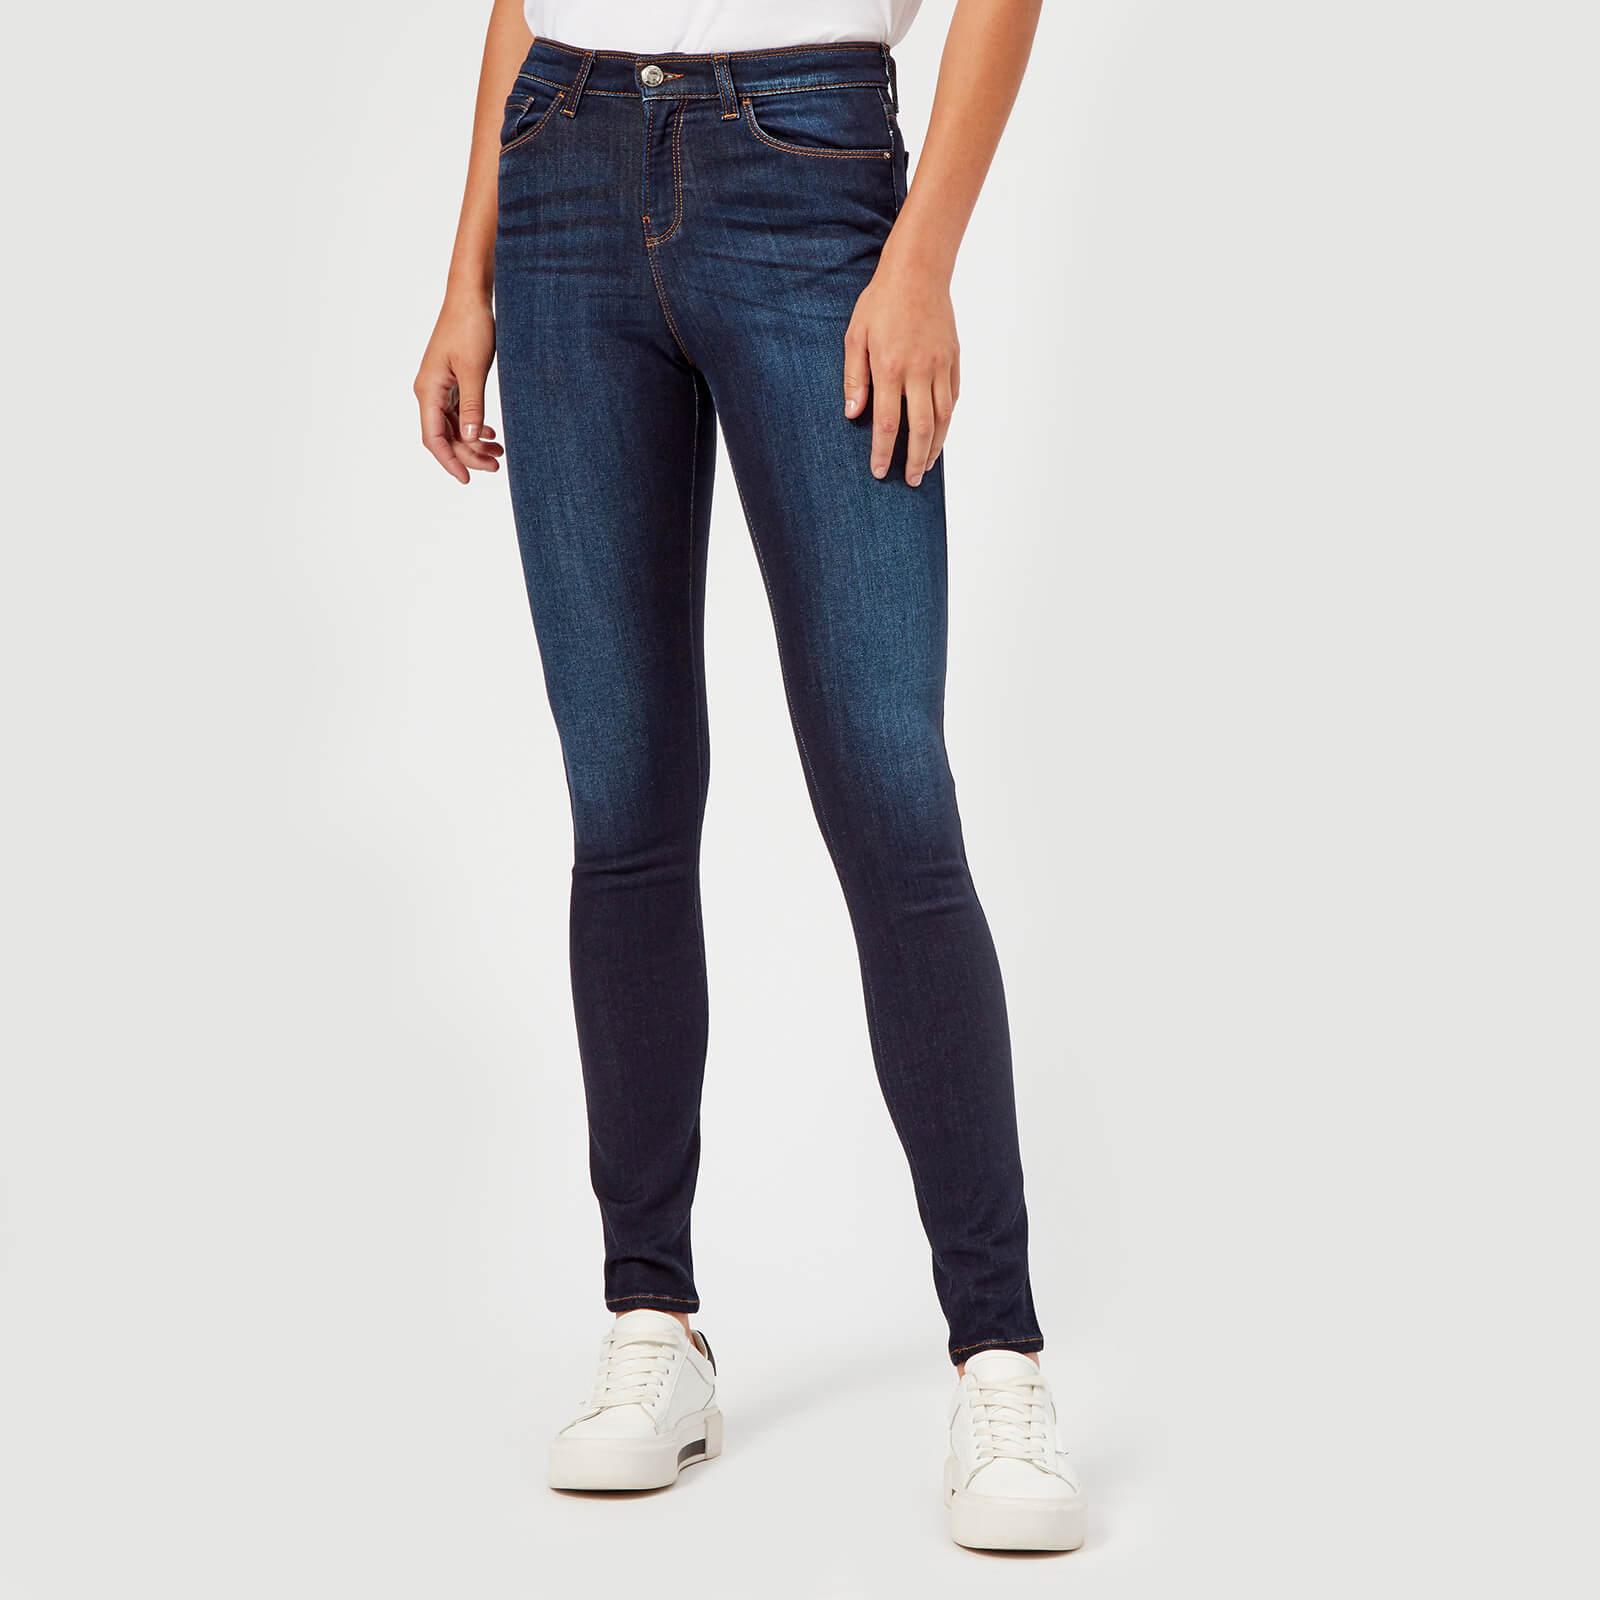 fe651f3570 Emporio Armani Women's J20 High Rise Jeans - Blue